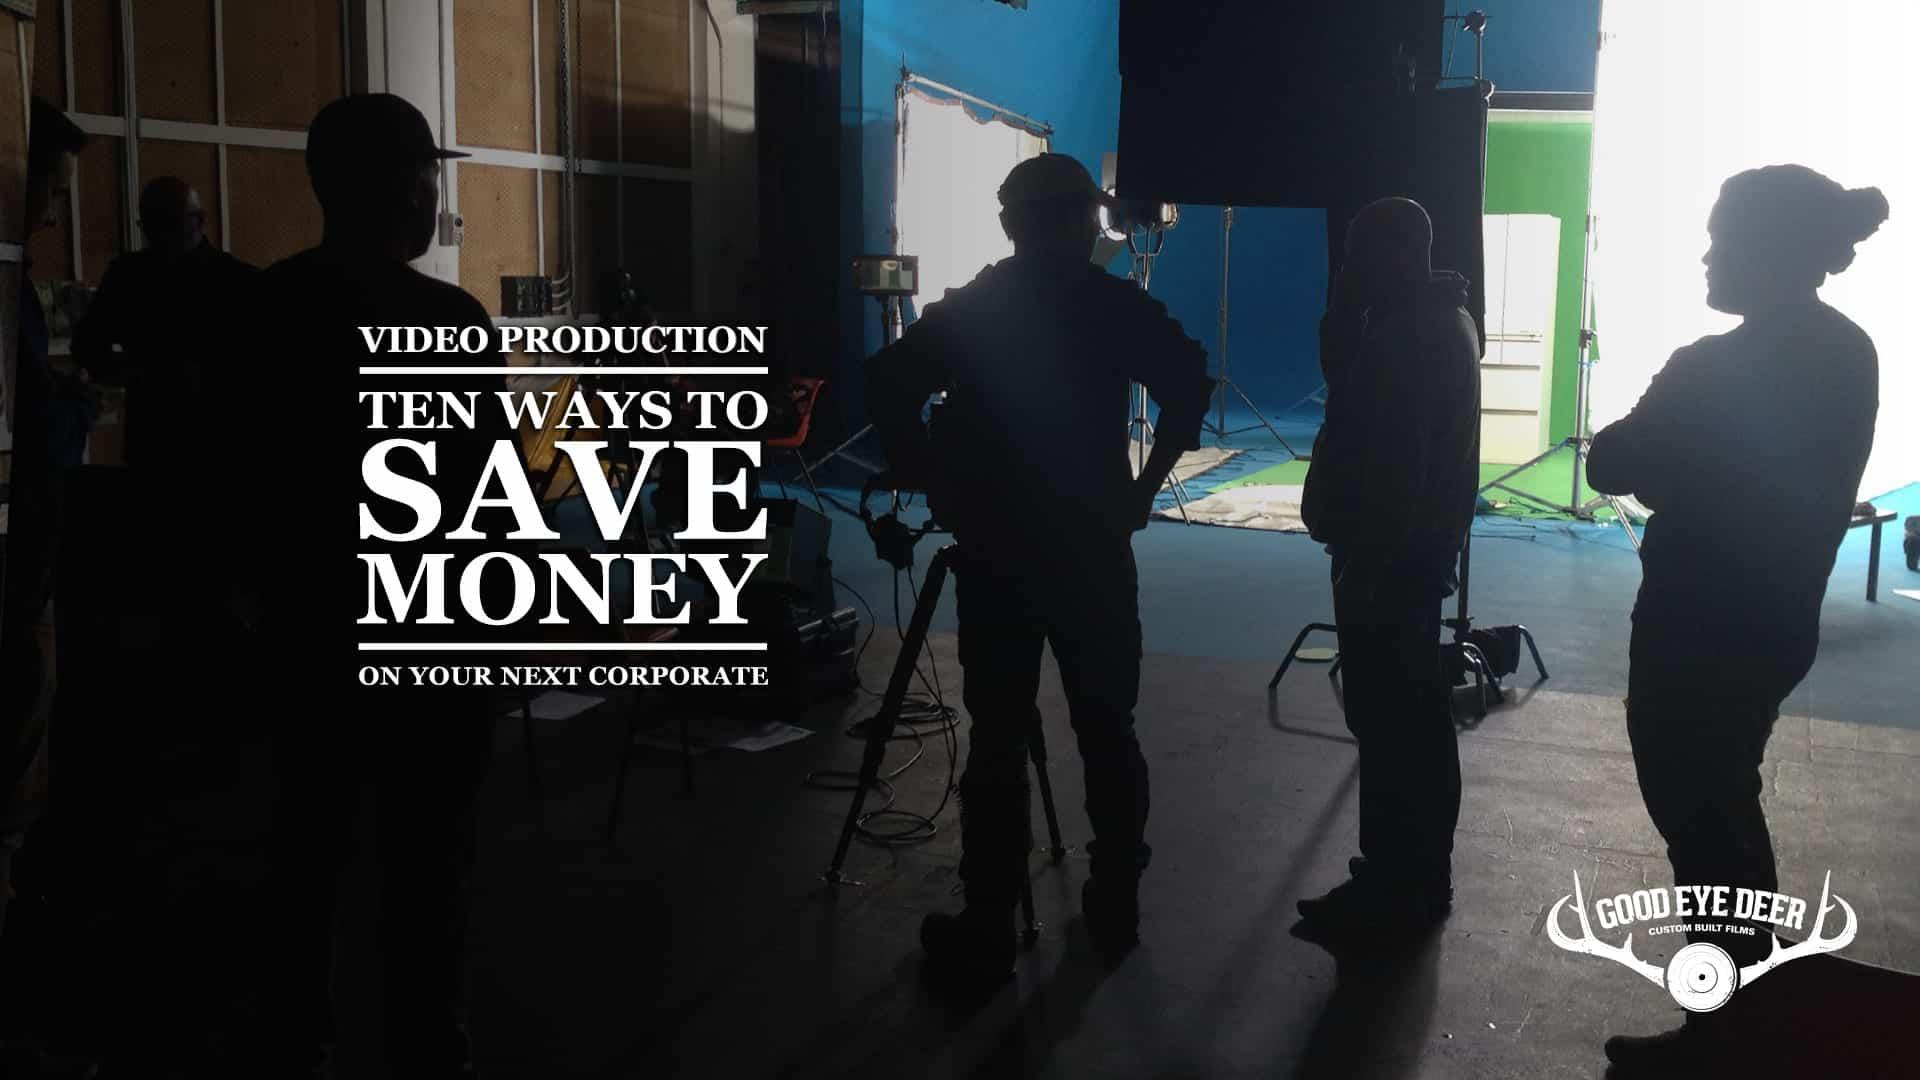 Save Money Corporate Video Production Sydney & Newcastle NSW